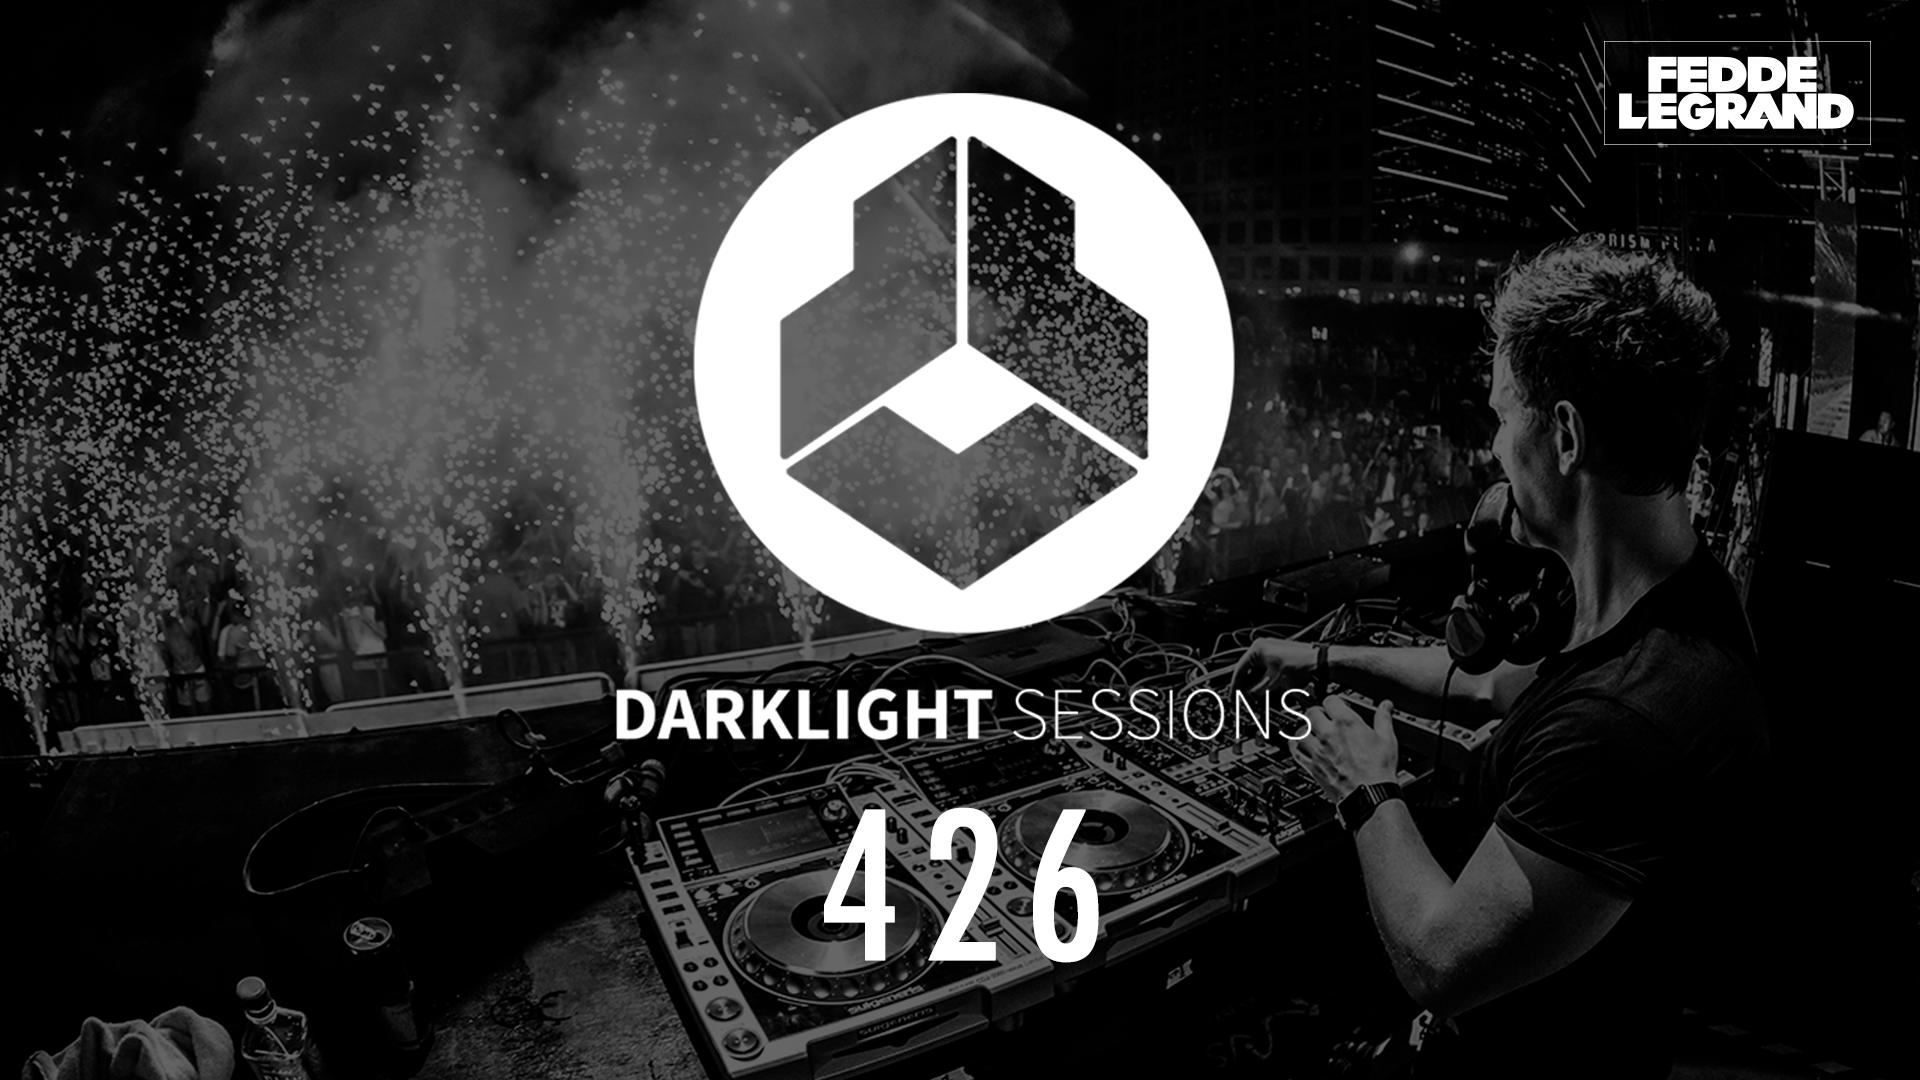 Darklight Sessions 426